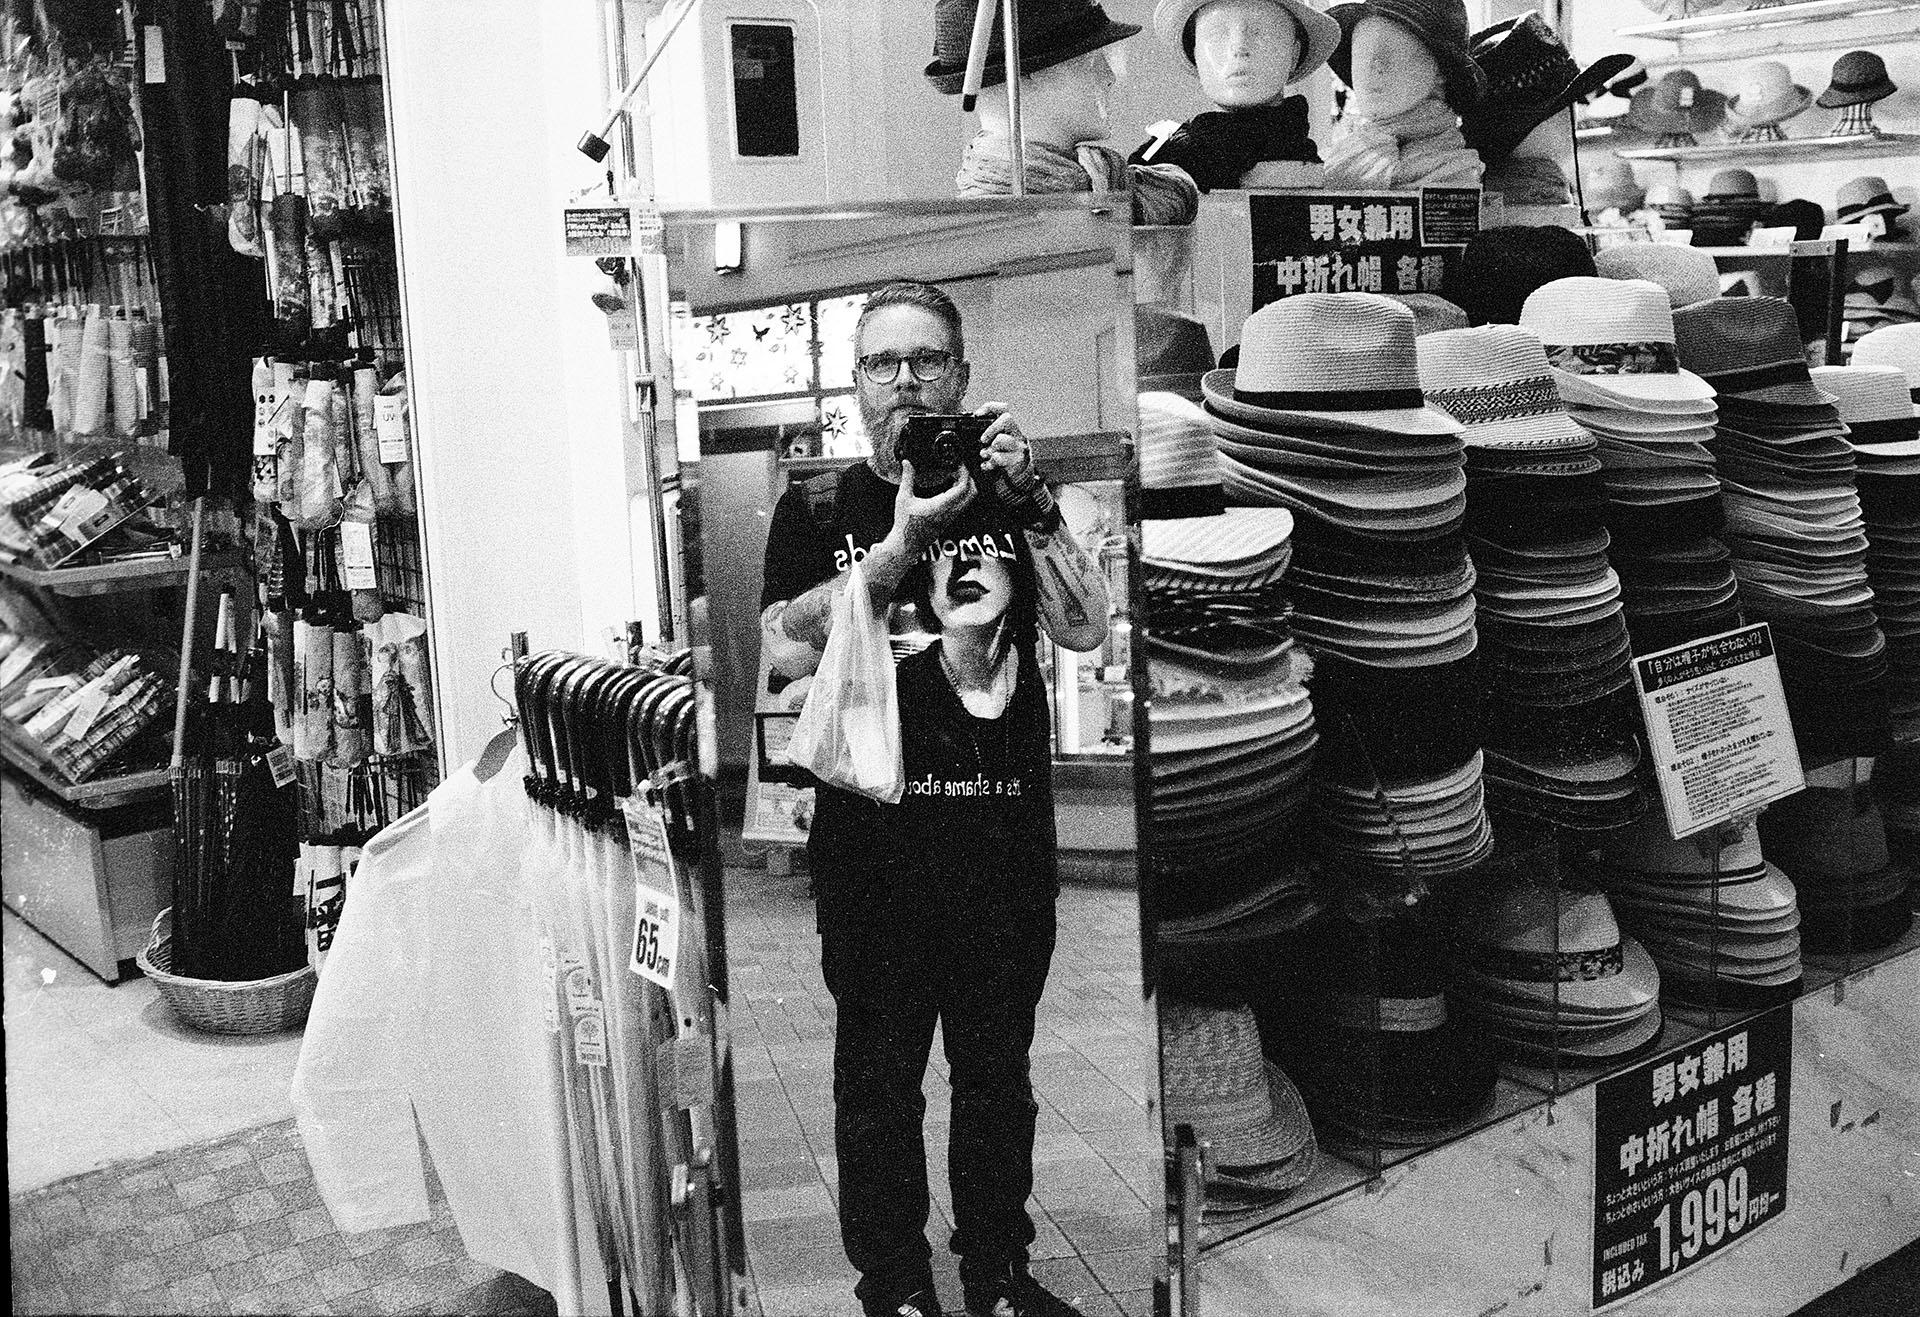 35mm selfie